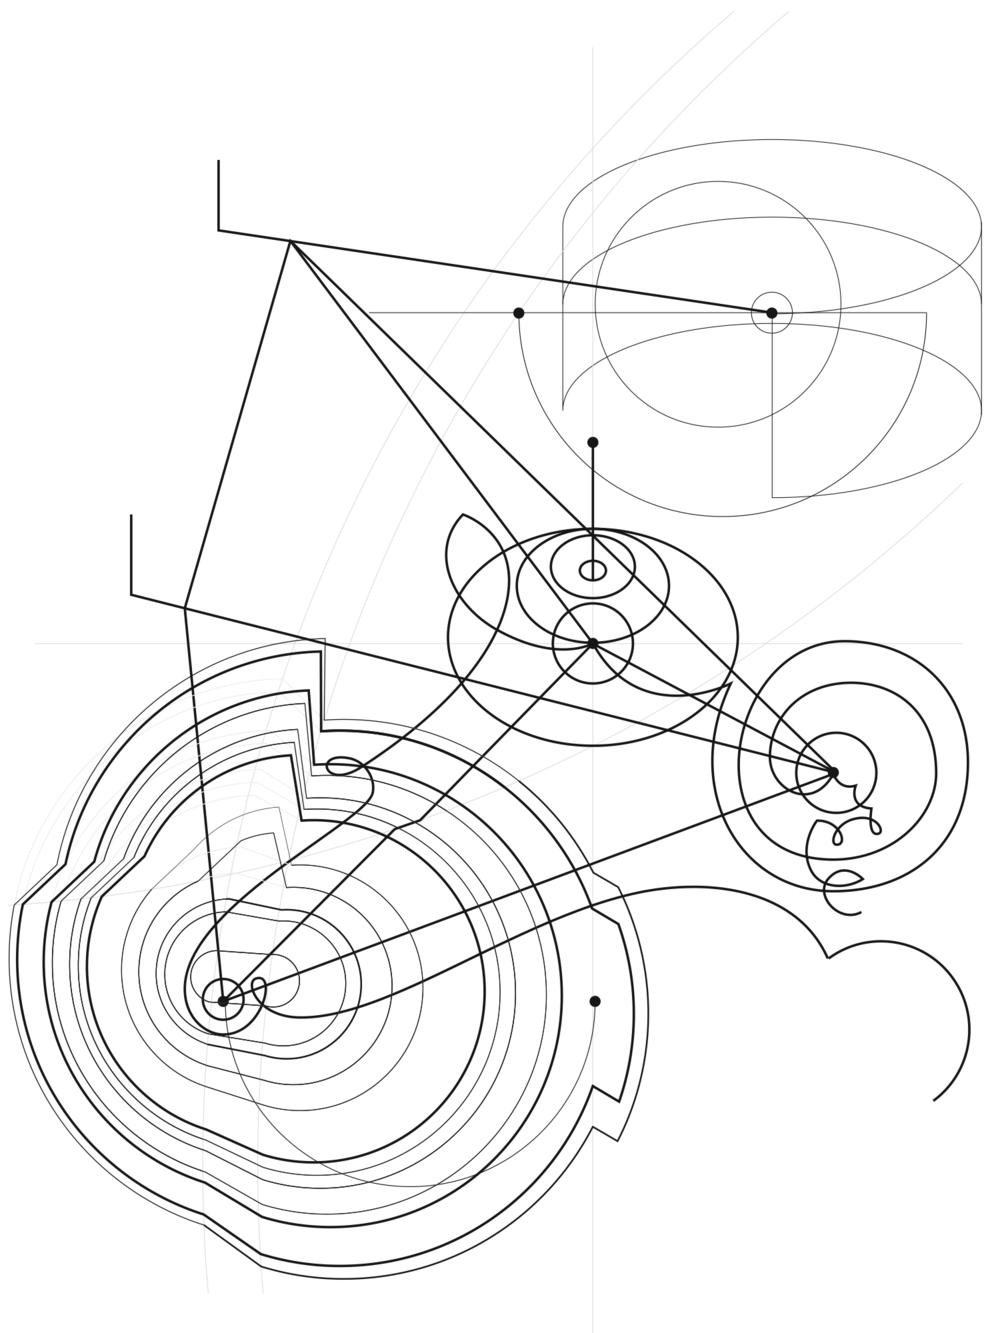 au-artcrank16-sketch8.jpg